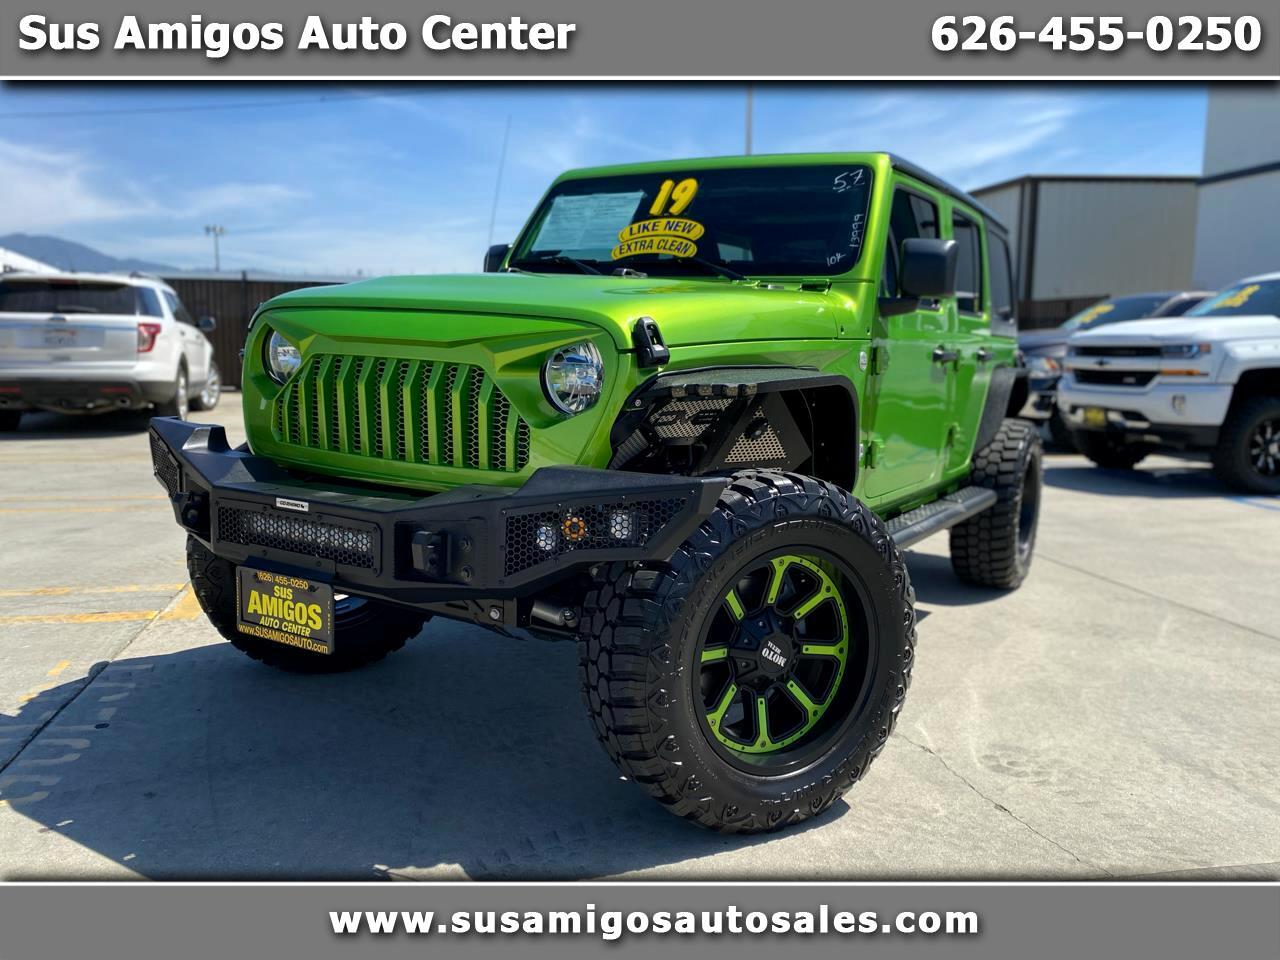 Jeep Wrangler Unlimited Sport S 4x4 2019